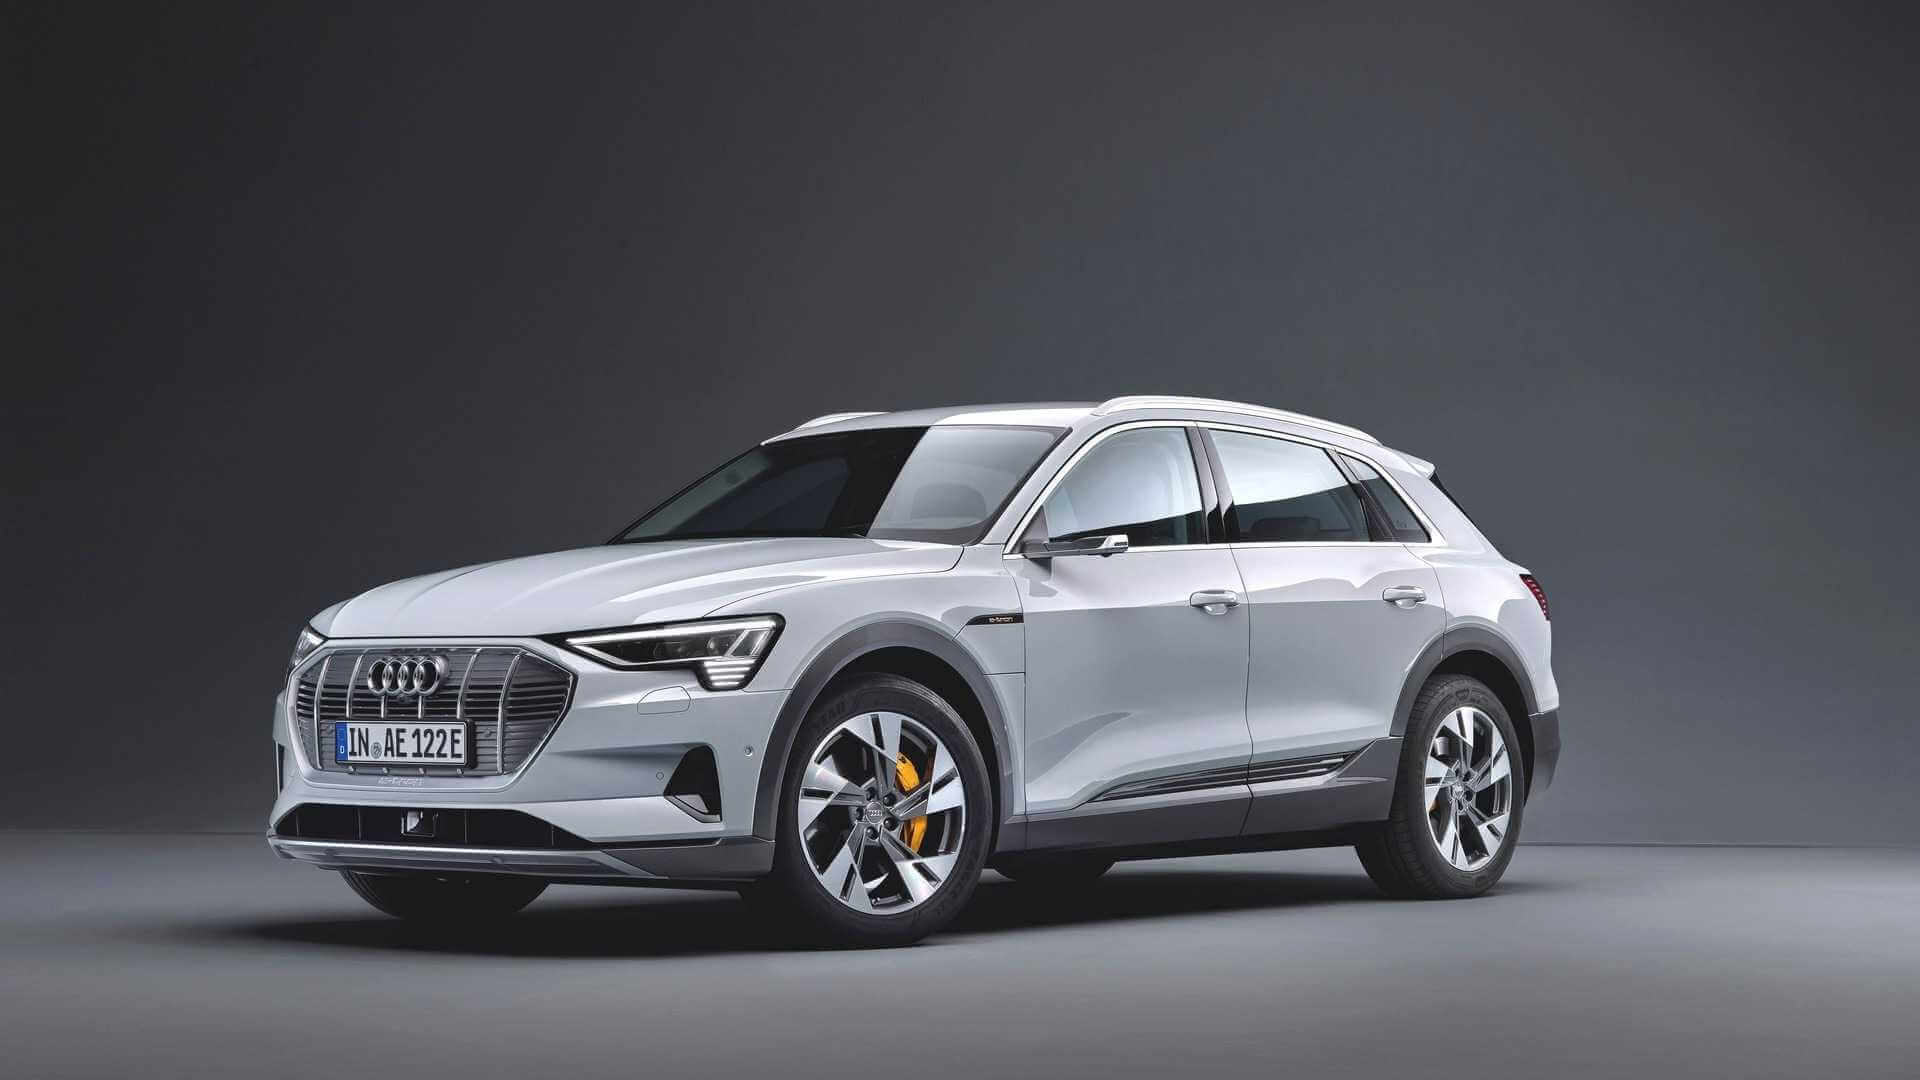 Audi представила более «дешевый» электрический кроссовер e-tron 50quattro сменьшим аккумулятором